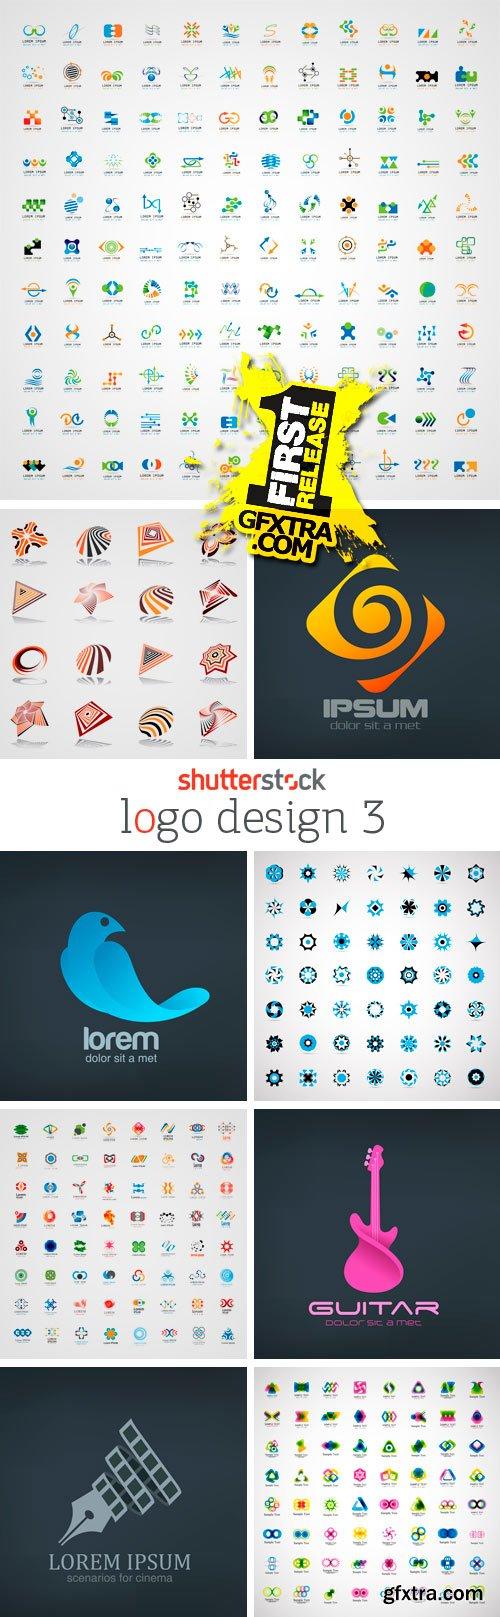 Amazing SS - Logo Design 3, 25xEPS